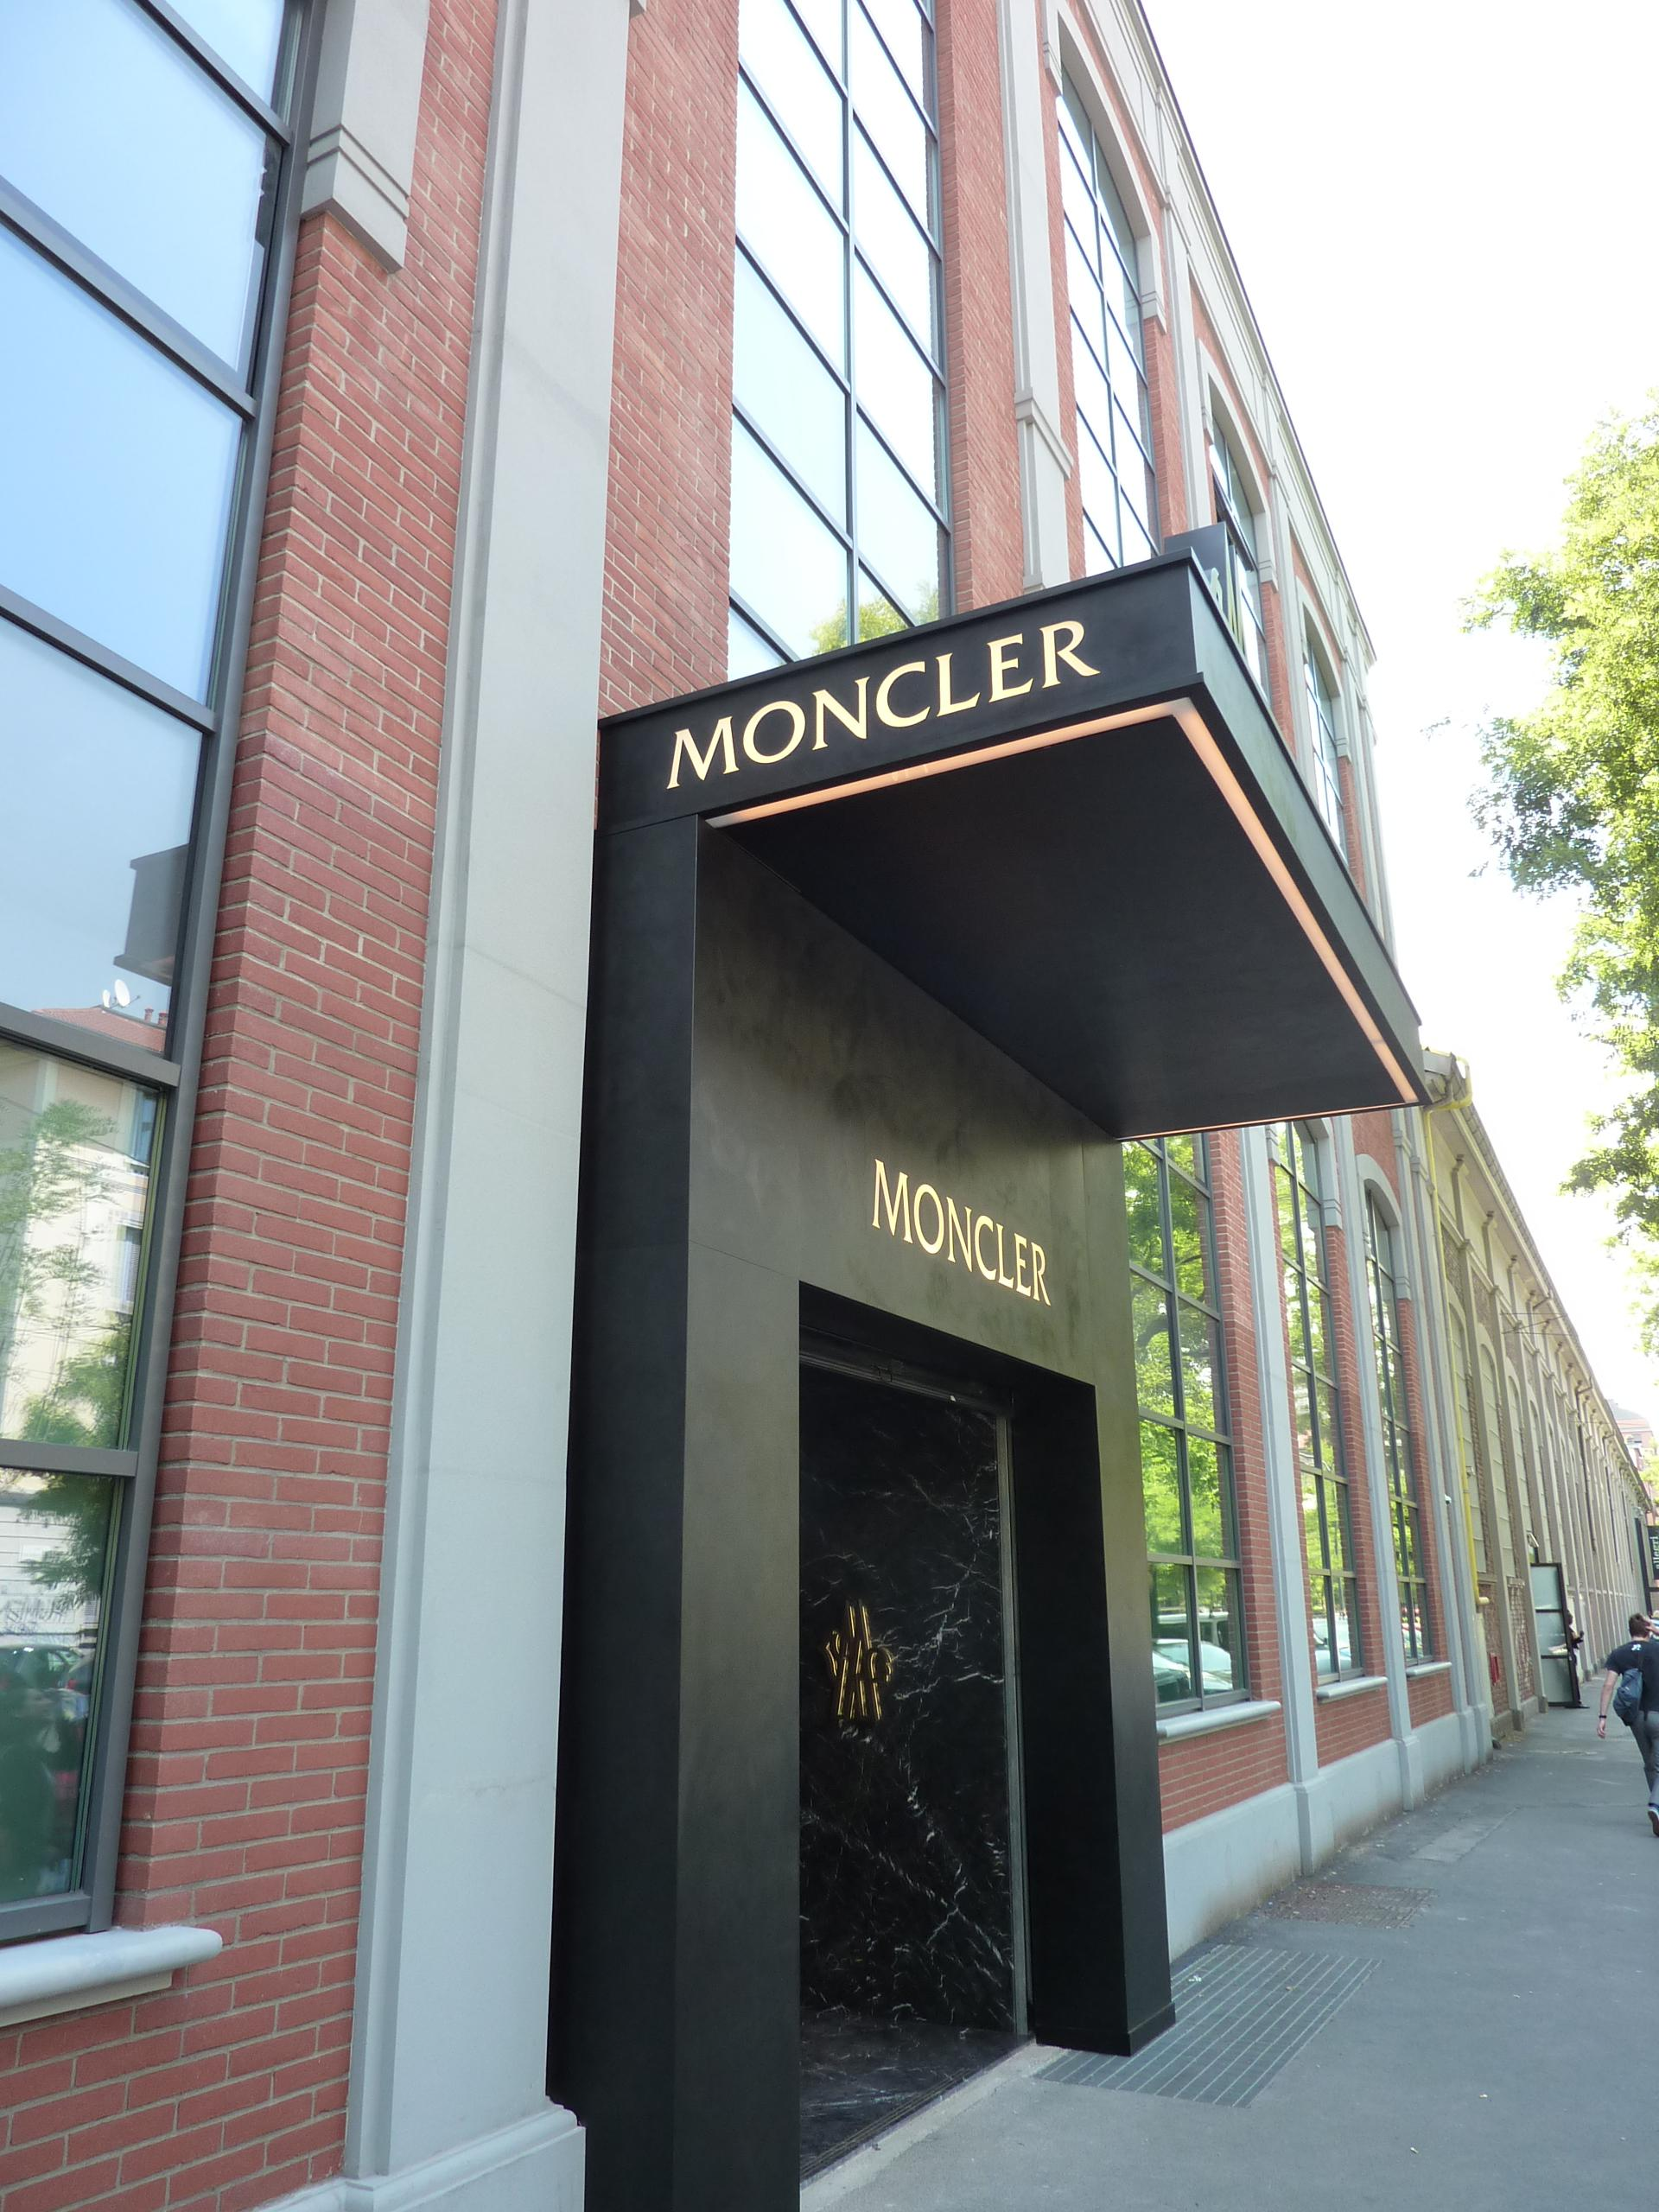 Uffici Moncler a Milano - 3